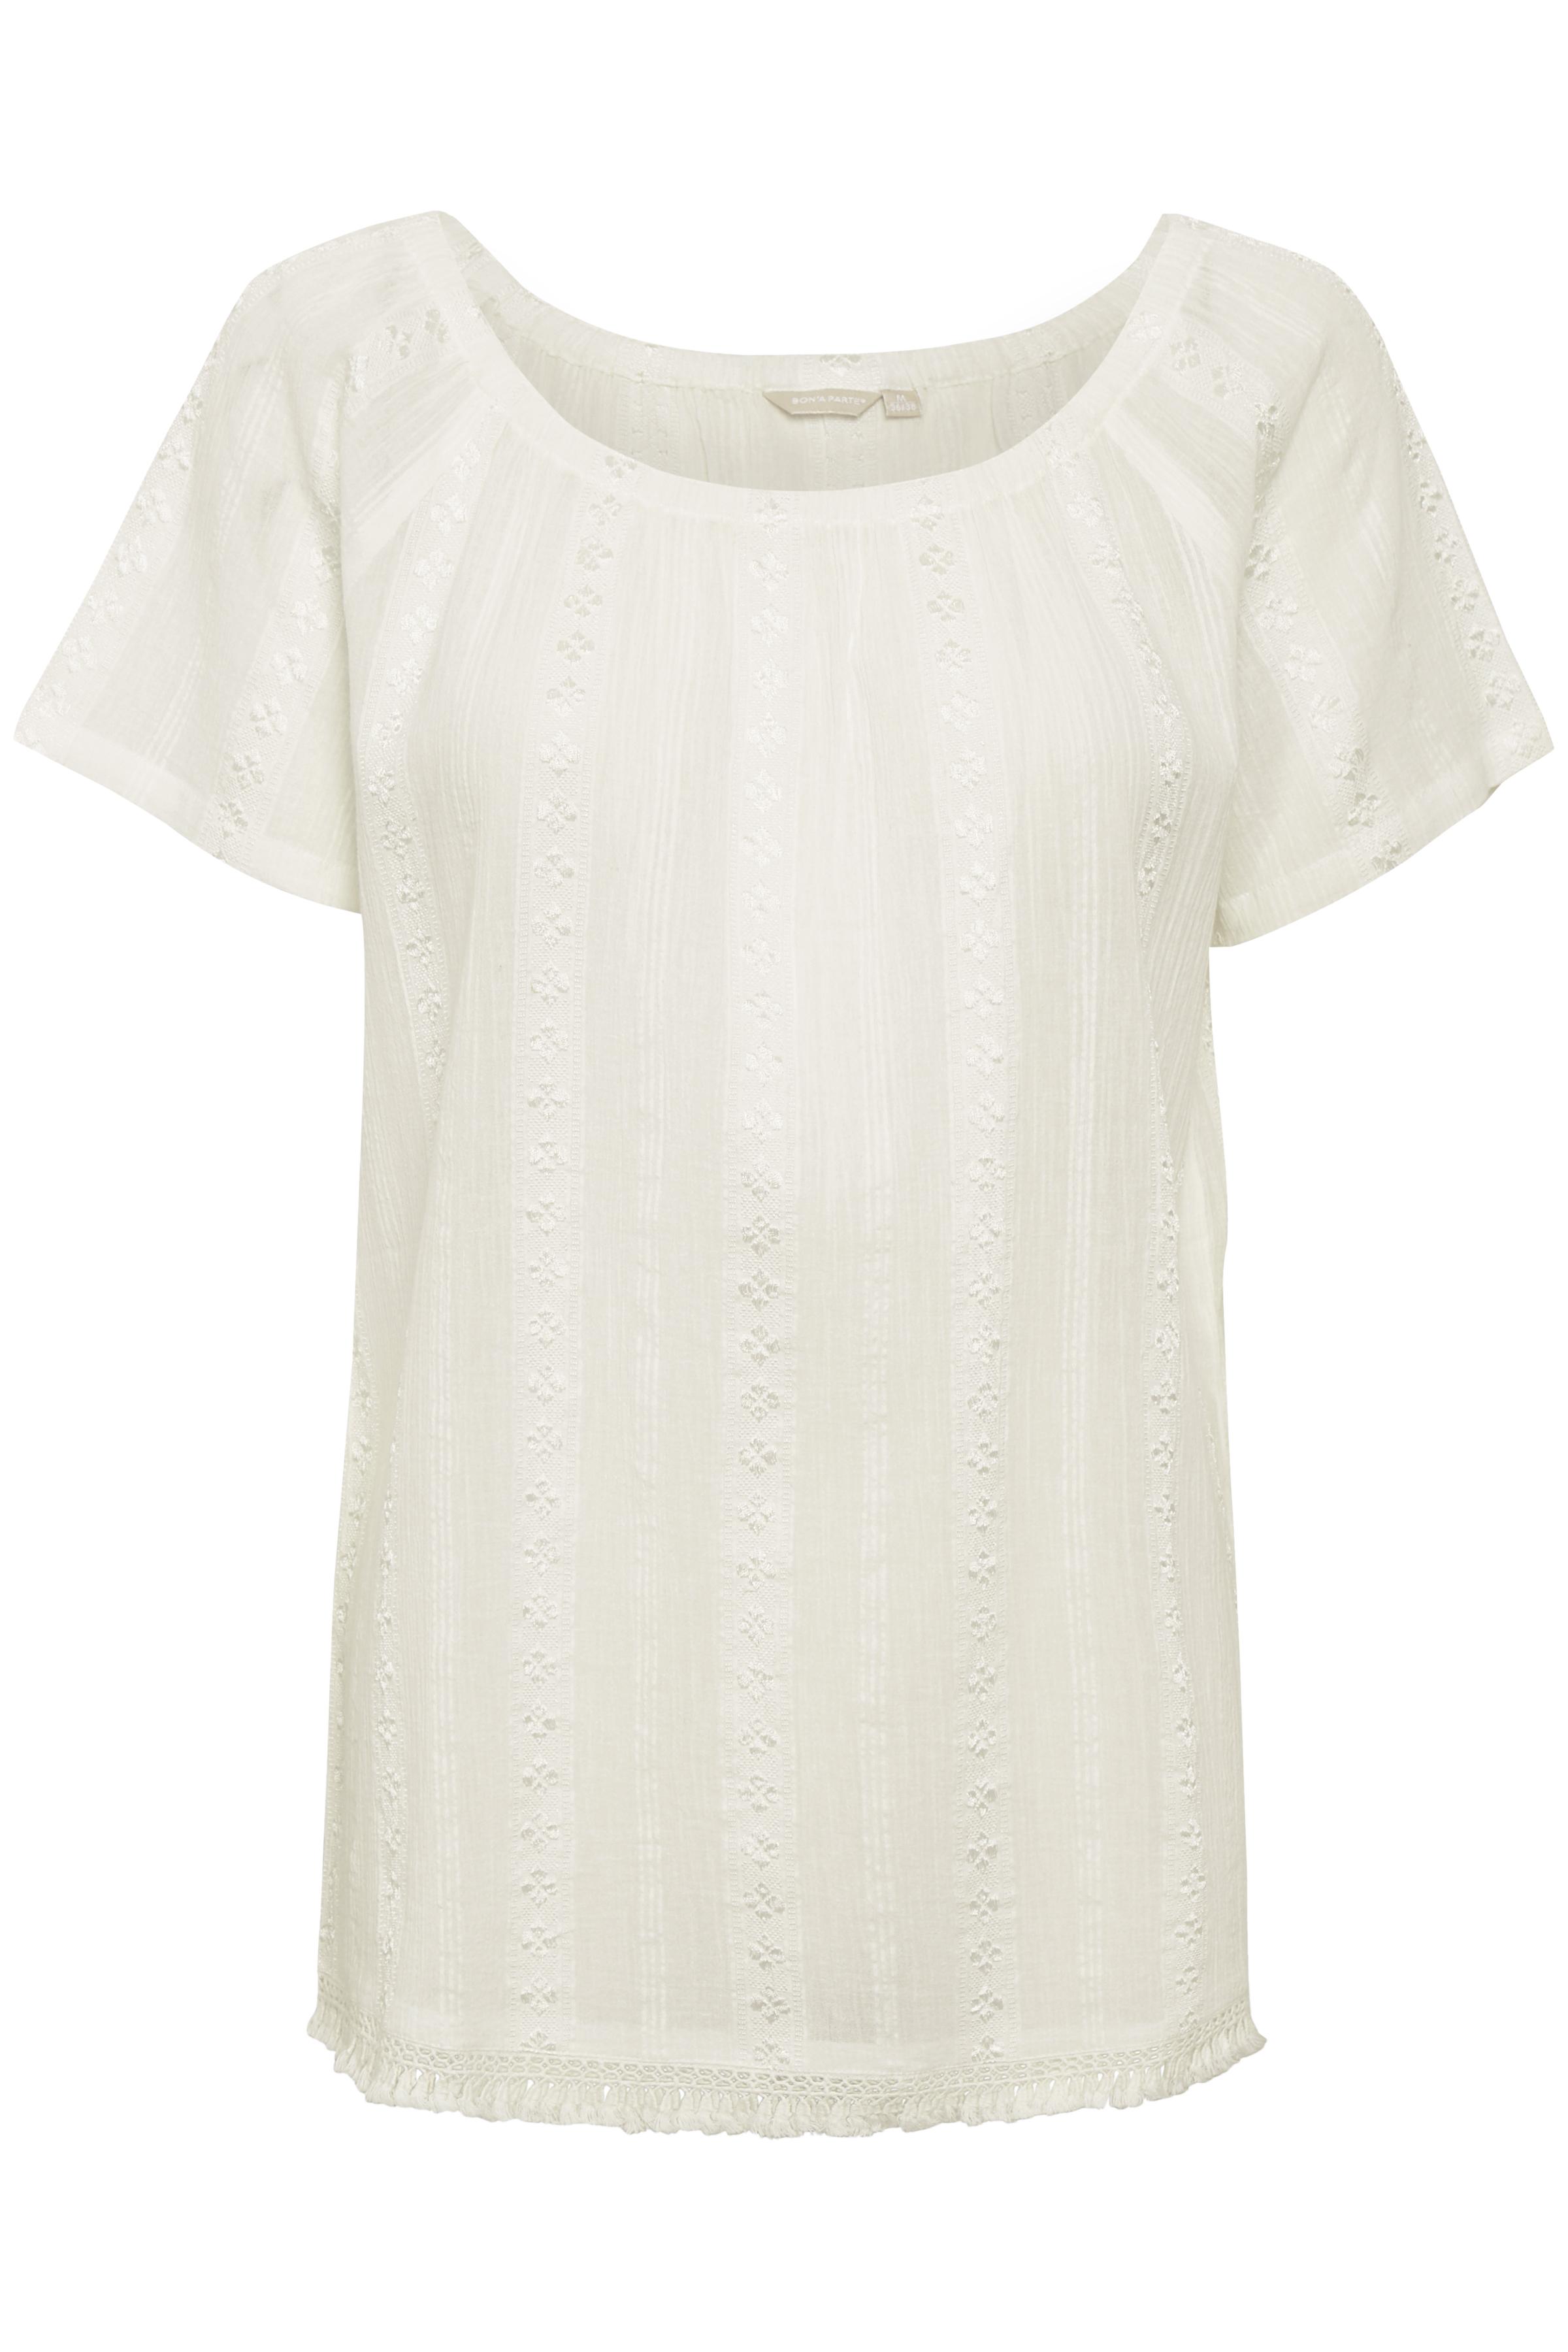 Image of BonA Parte Dame Bluse - Off-white